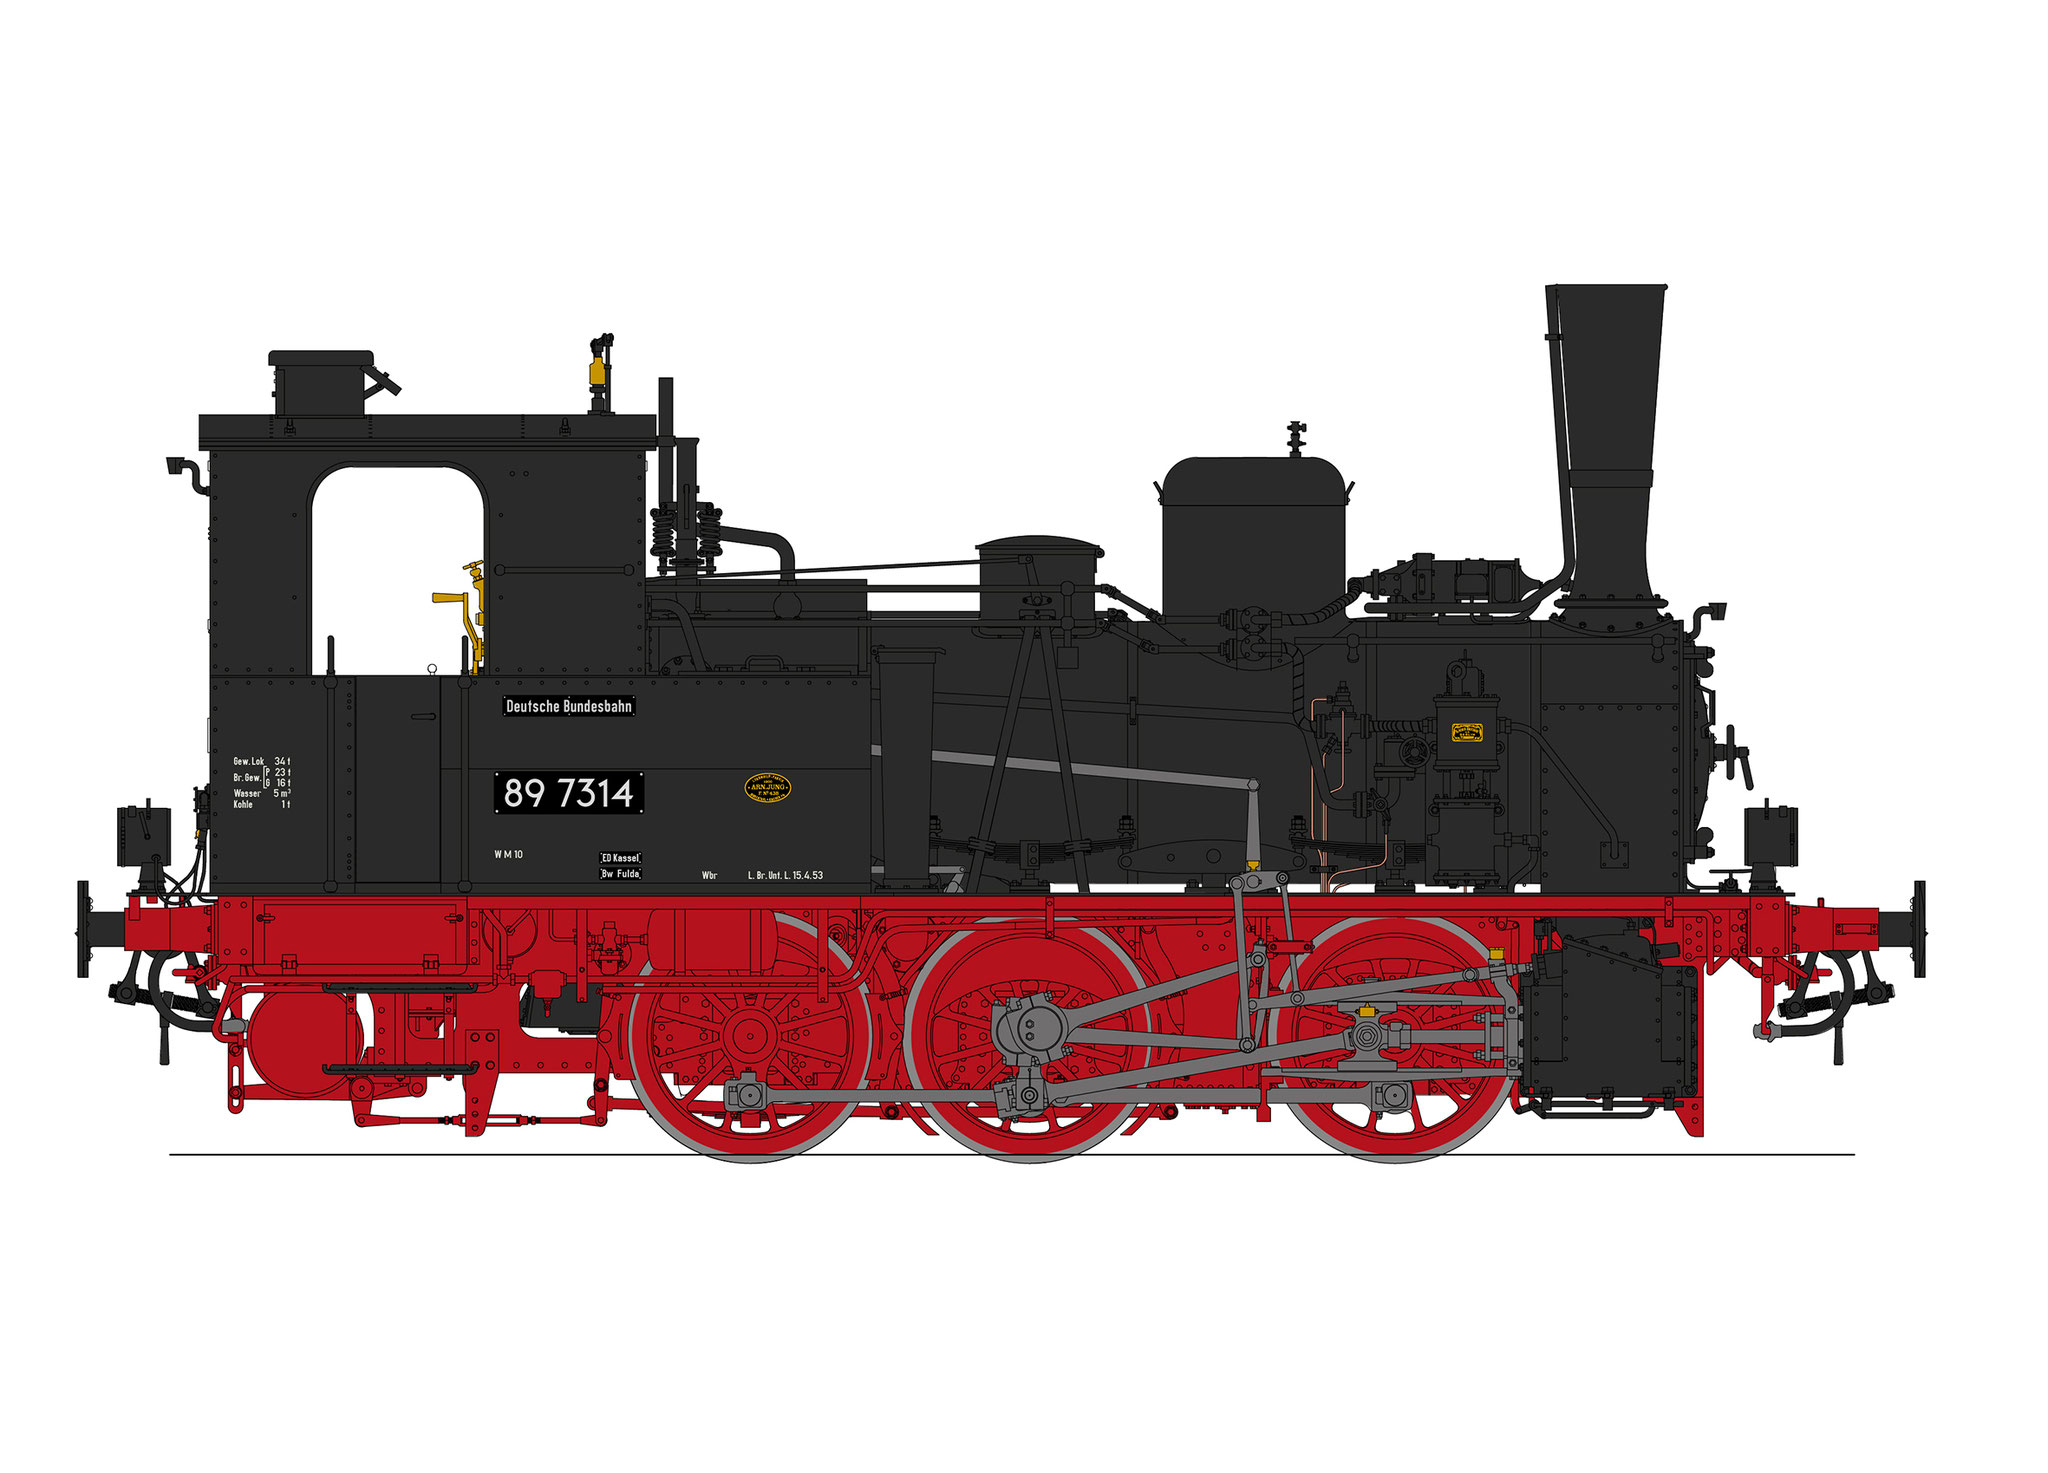 Bestell-Nr. 11029 - Colorierung